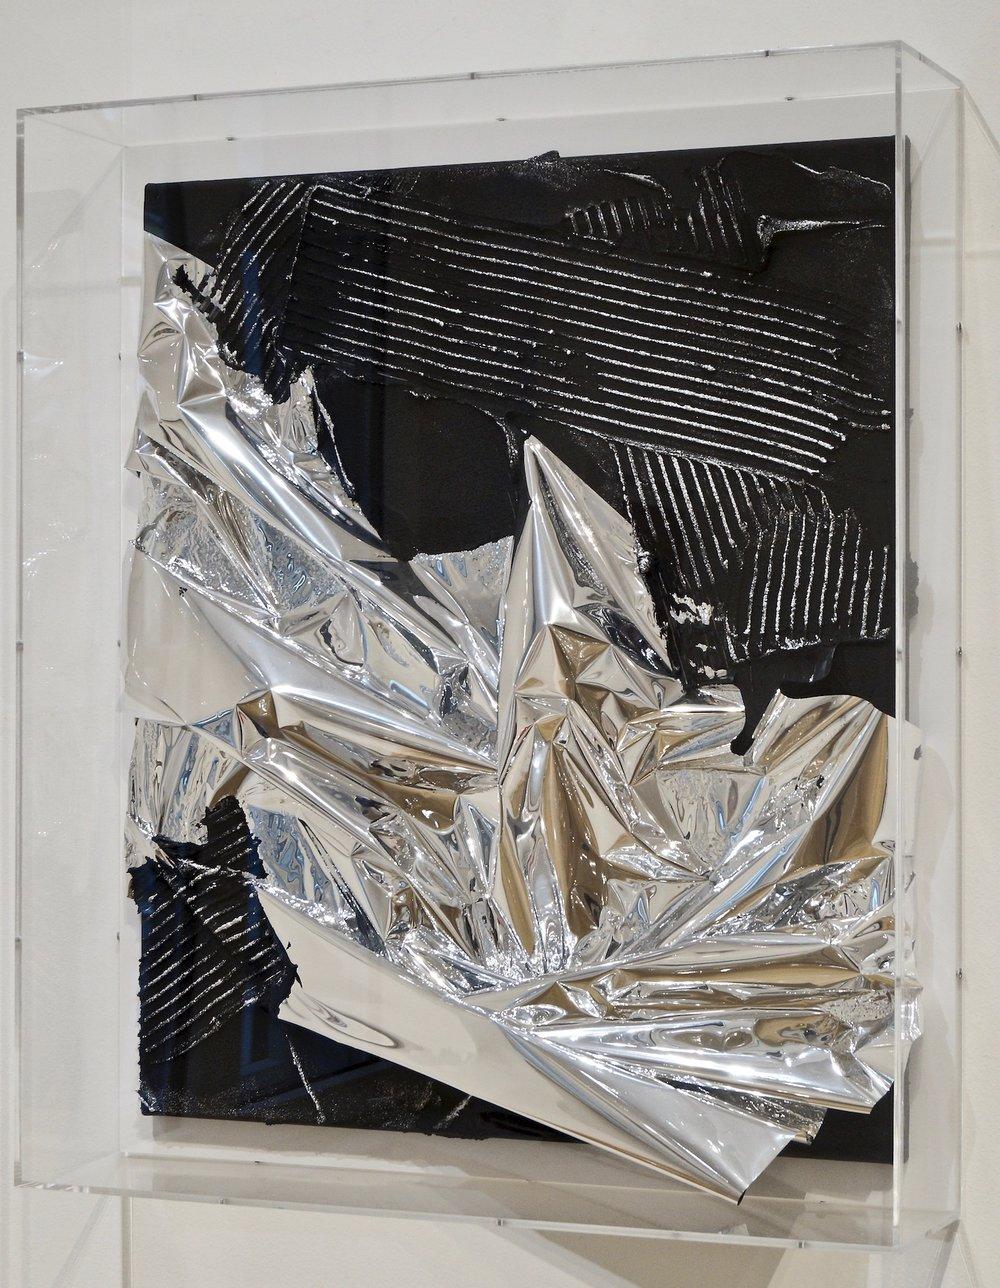 Anselm Reyle  Untitled, 2007